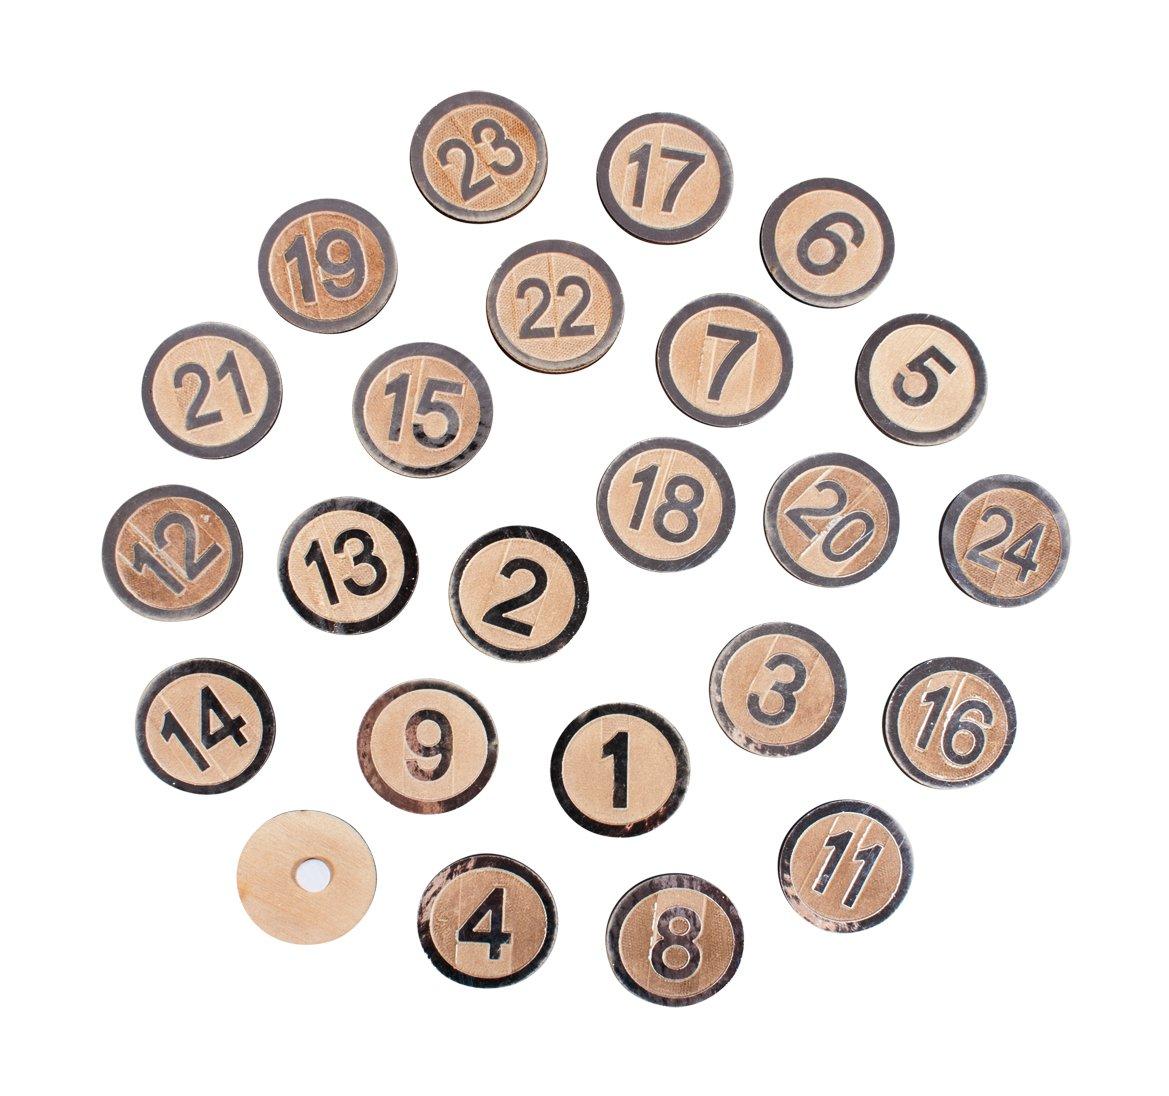 Rayher 46291606 MDF-Advent calend.Numerals 1-24, 3.5cm ø, Silver